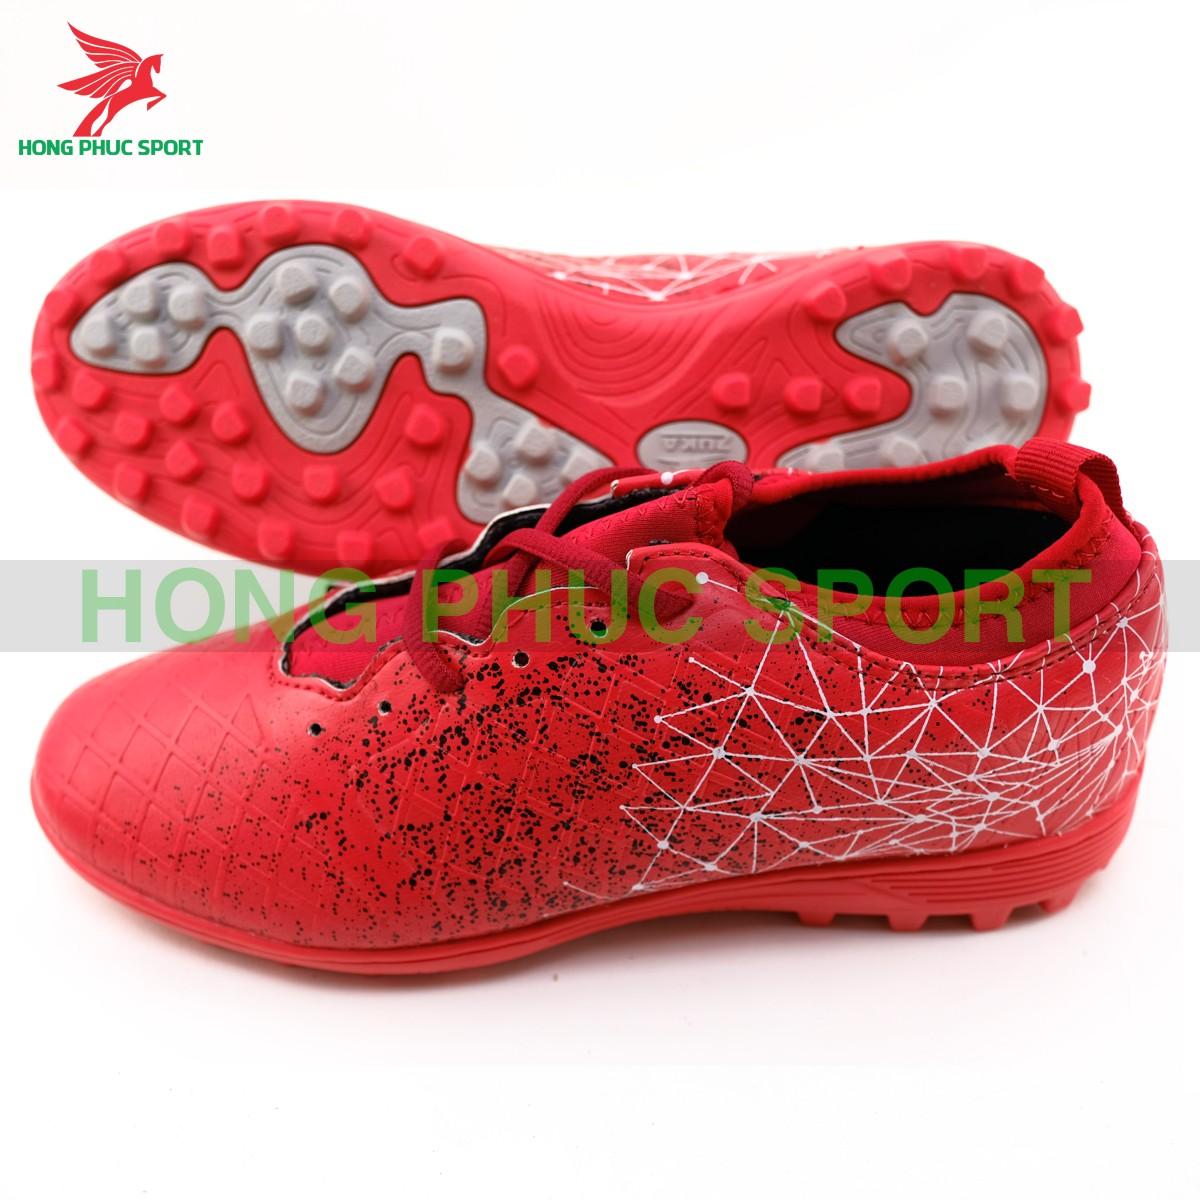 Giay-da-bong-Hong-Phuc-premium-21-3-2021-mau-do